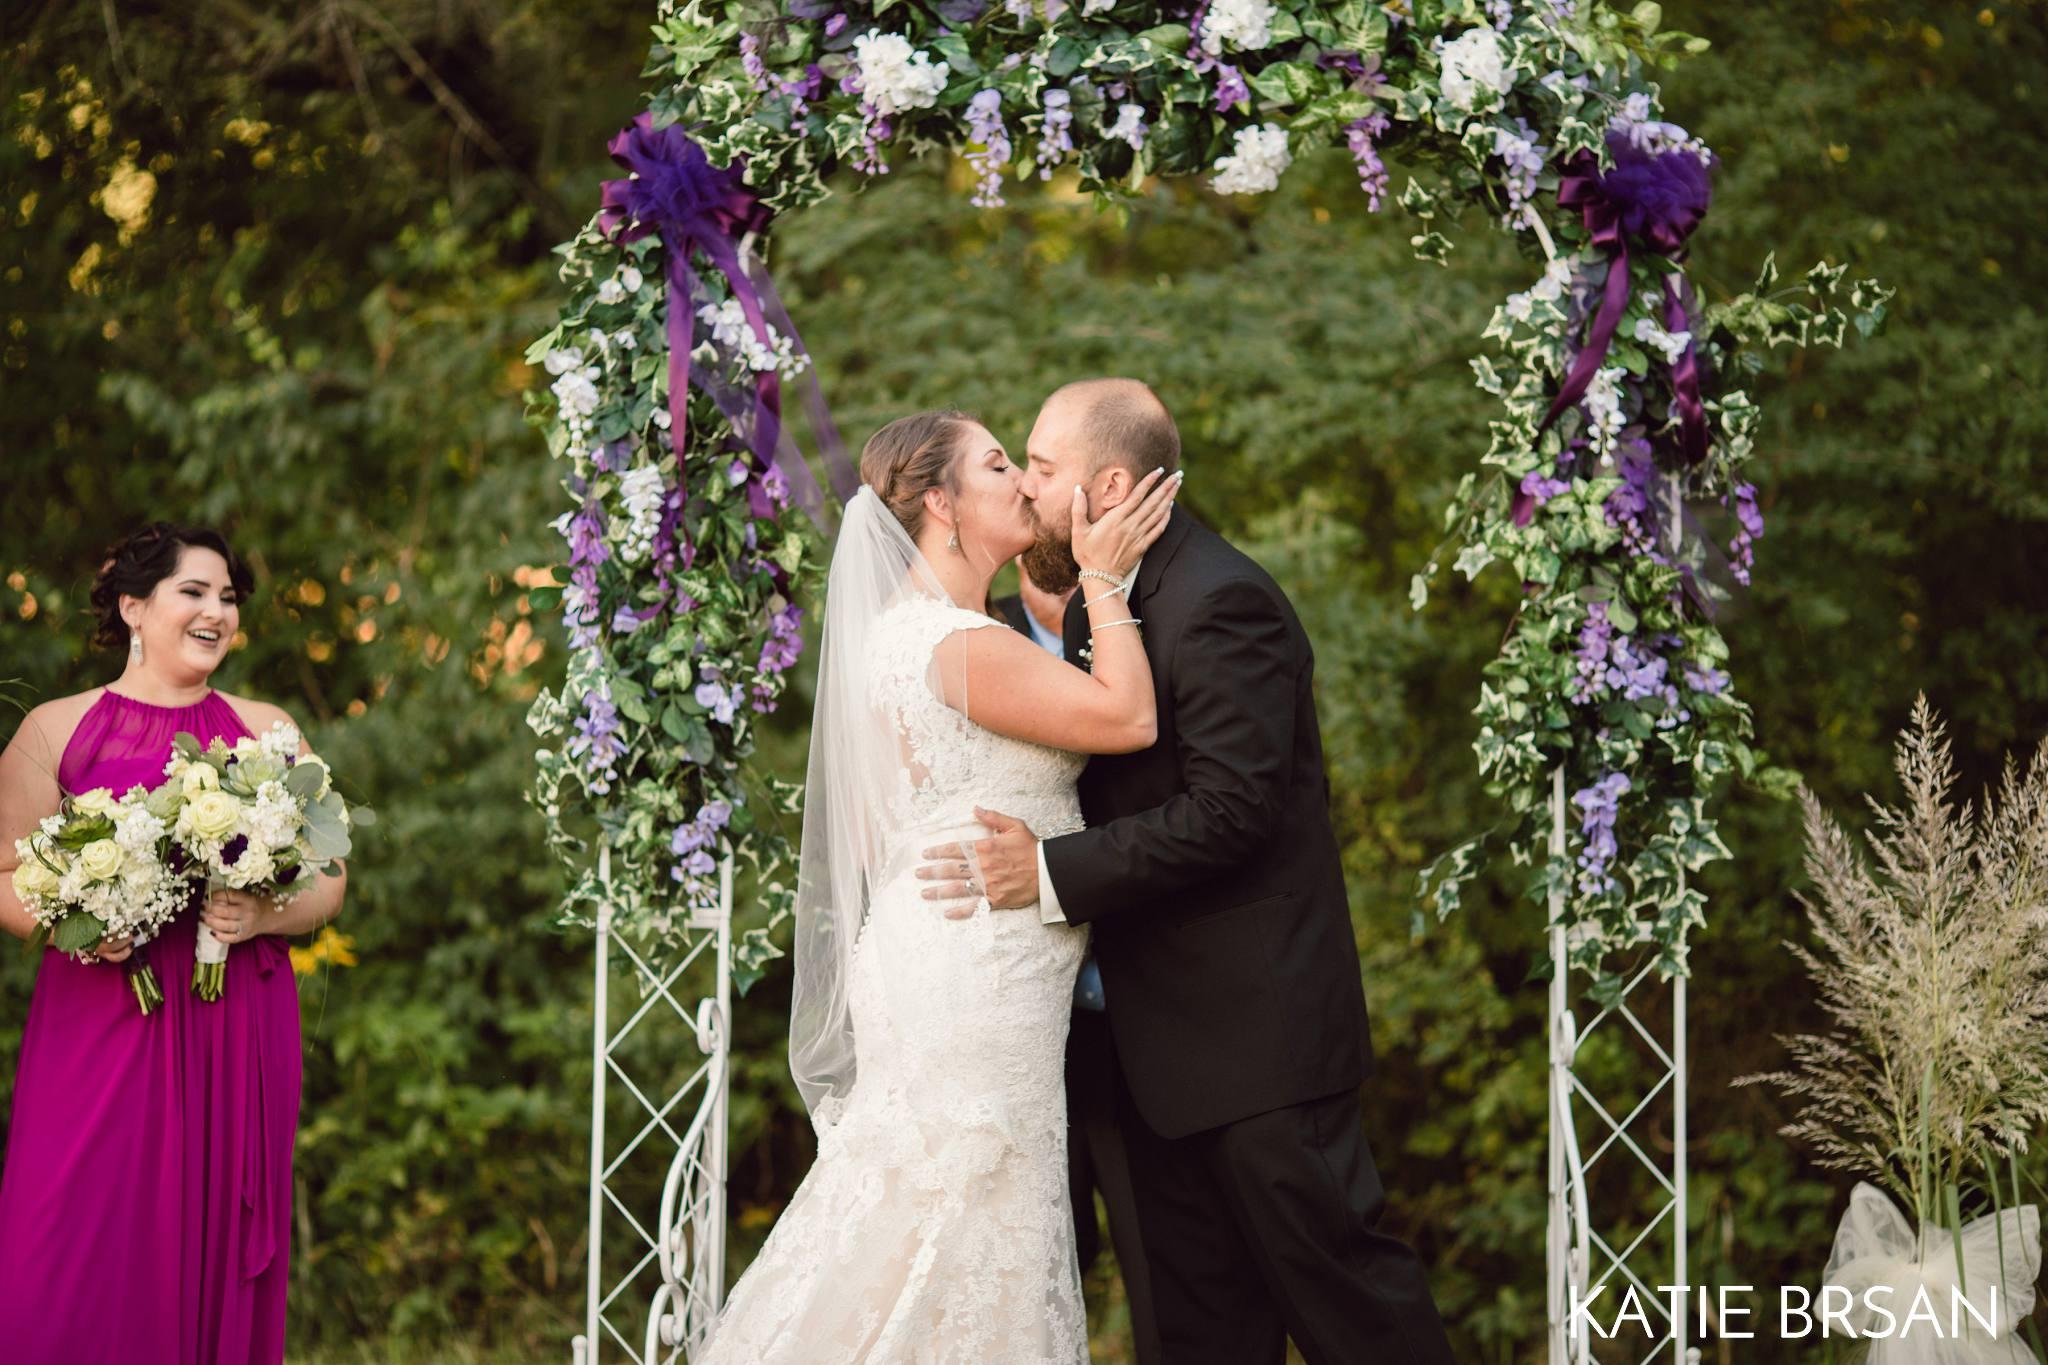 KatieBrsan-Bonfield-Backyard-Wedding_0408.jpg